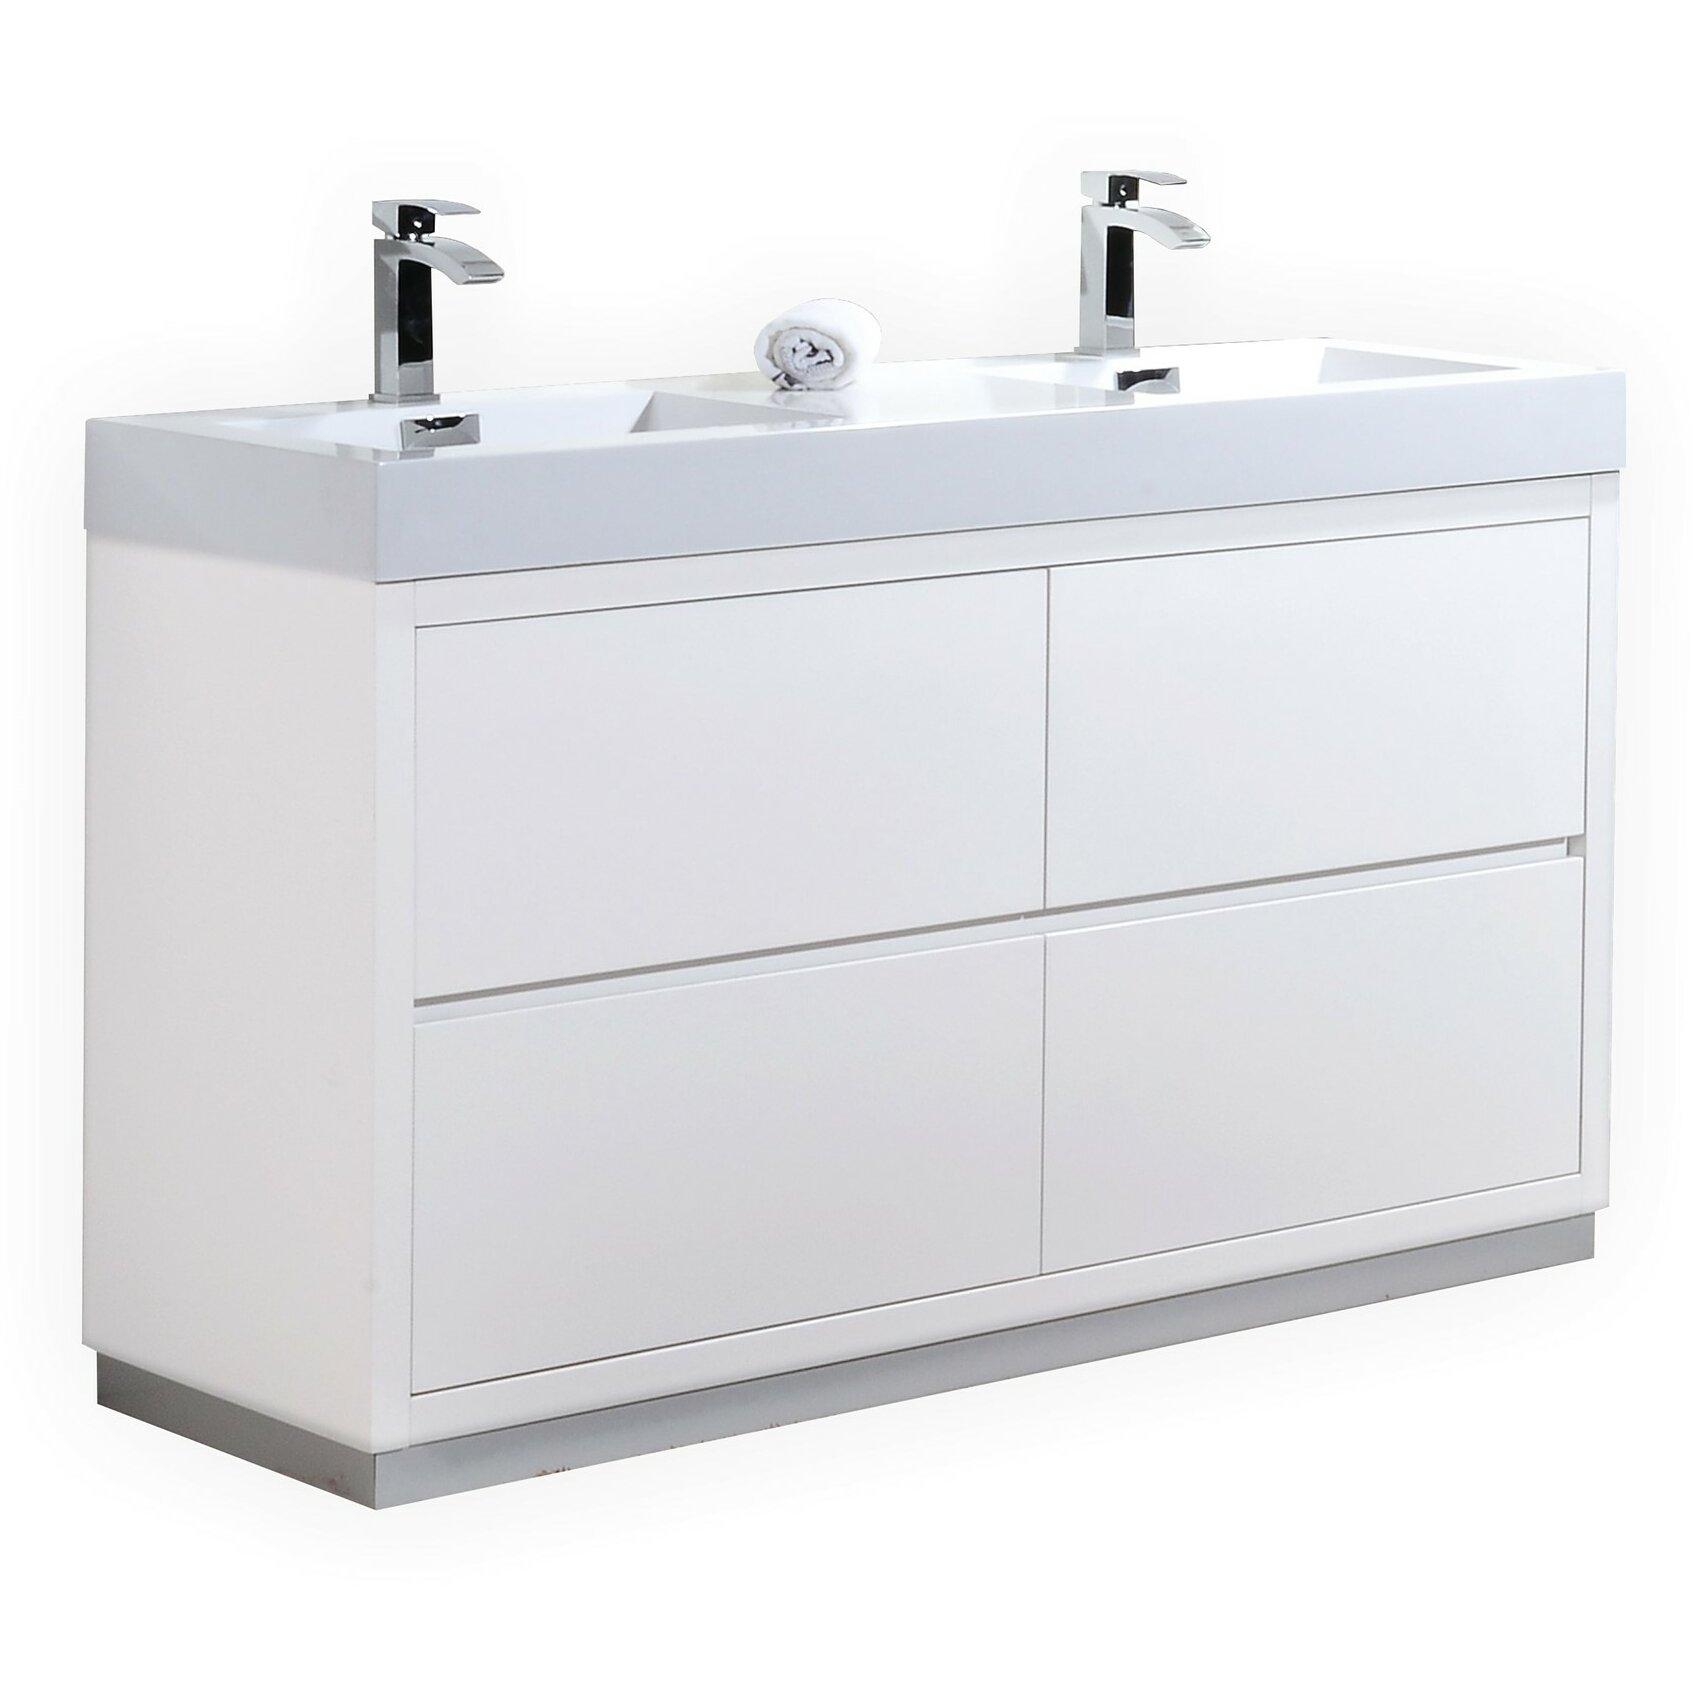 Bliss 60 double free standing modern bathroom vanity set wayfair for Free standing bathroom vanities